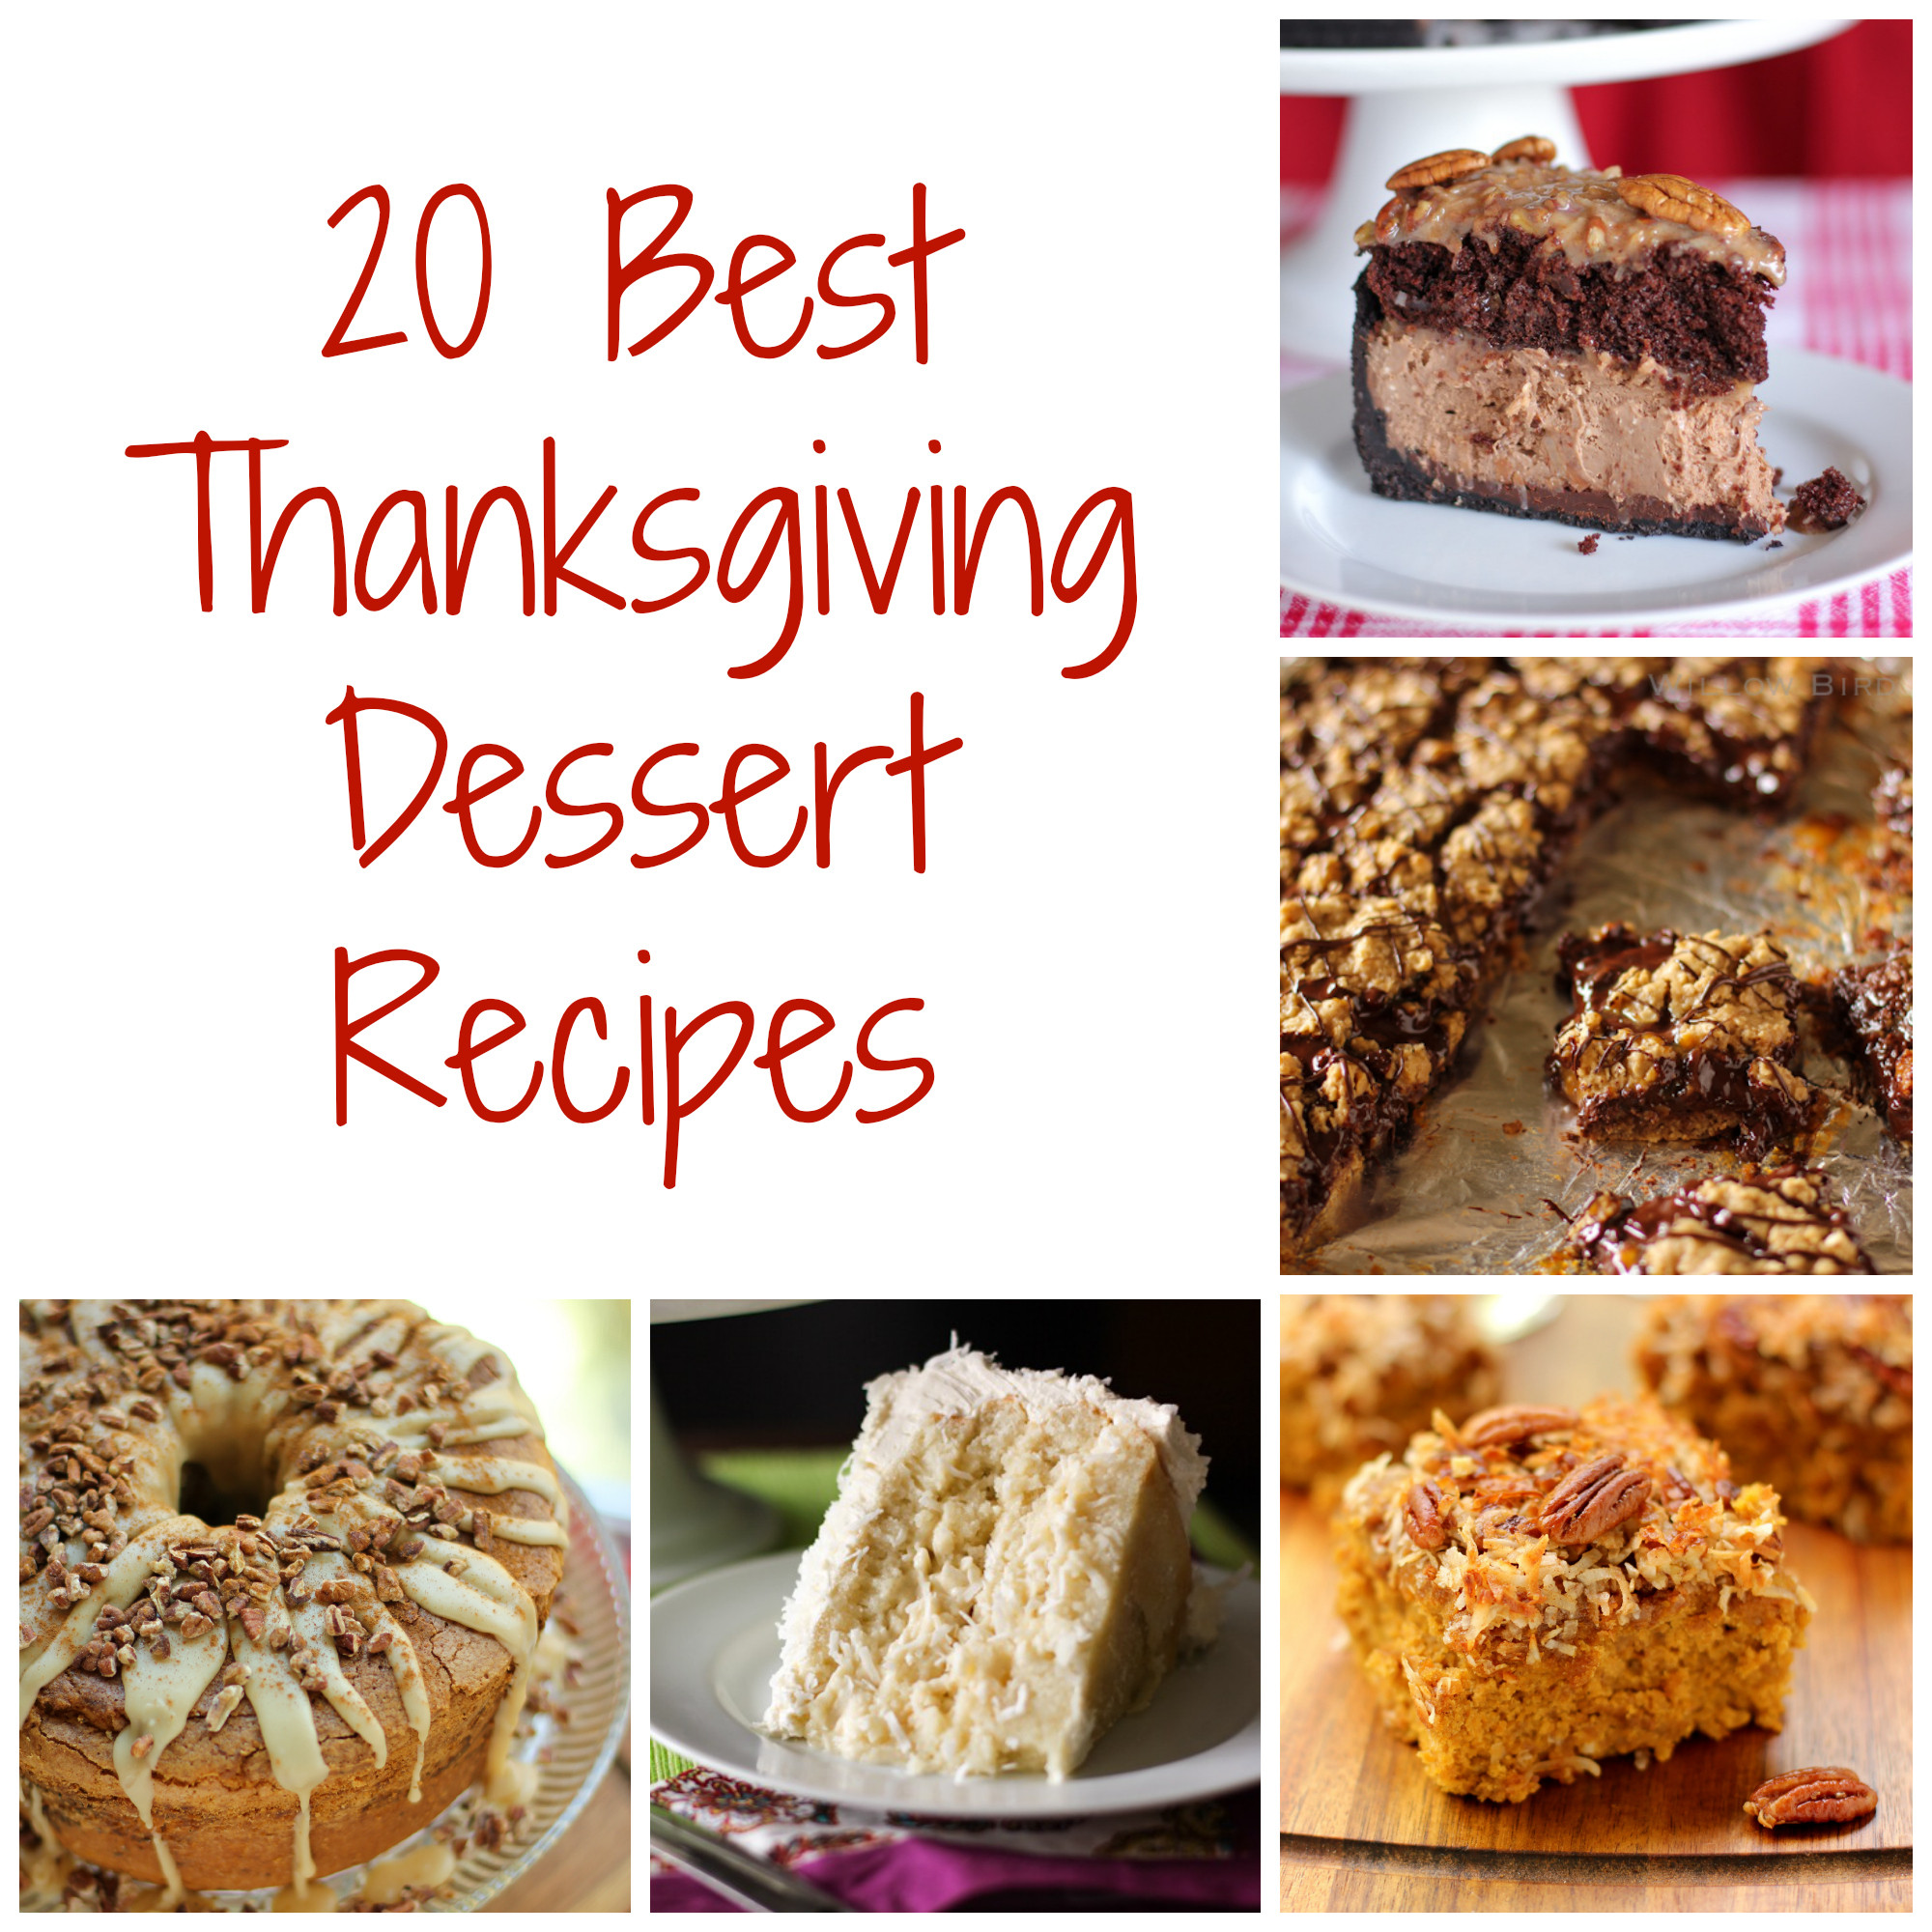 Best Thanksgiving Pie Recipes  Thanksgiving Dessert Recipes Willow Bird Baking